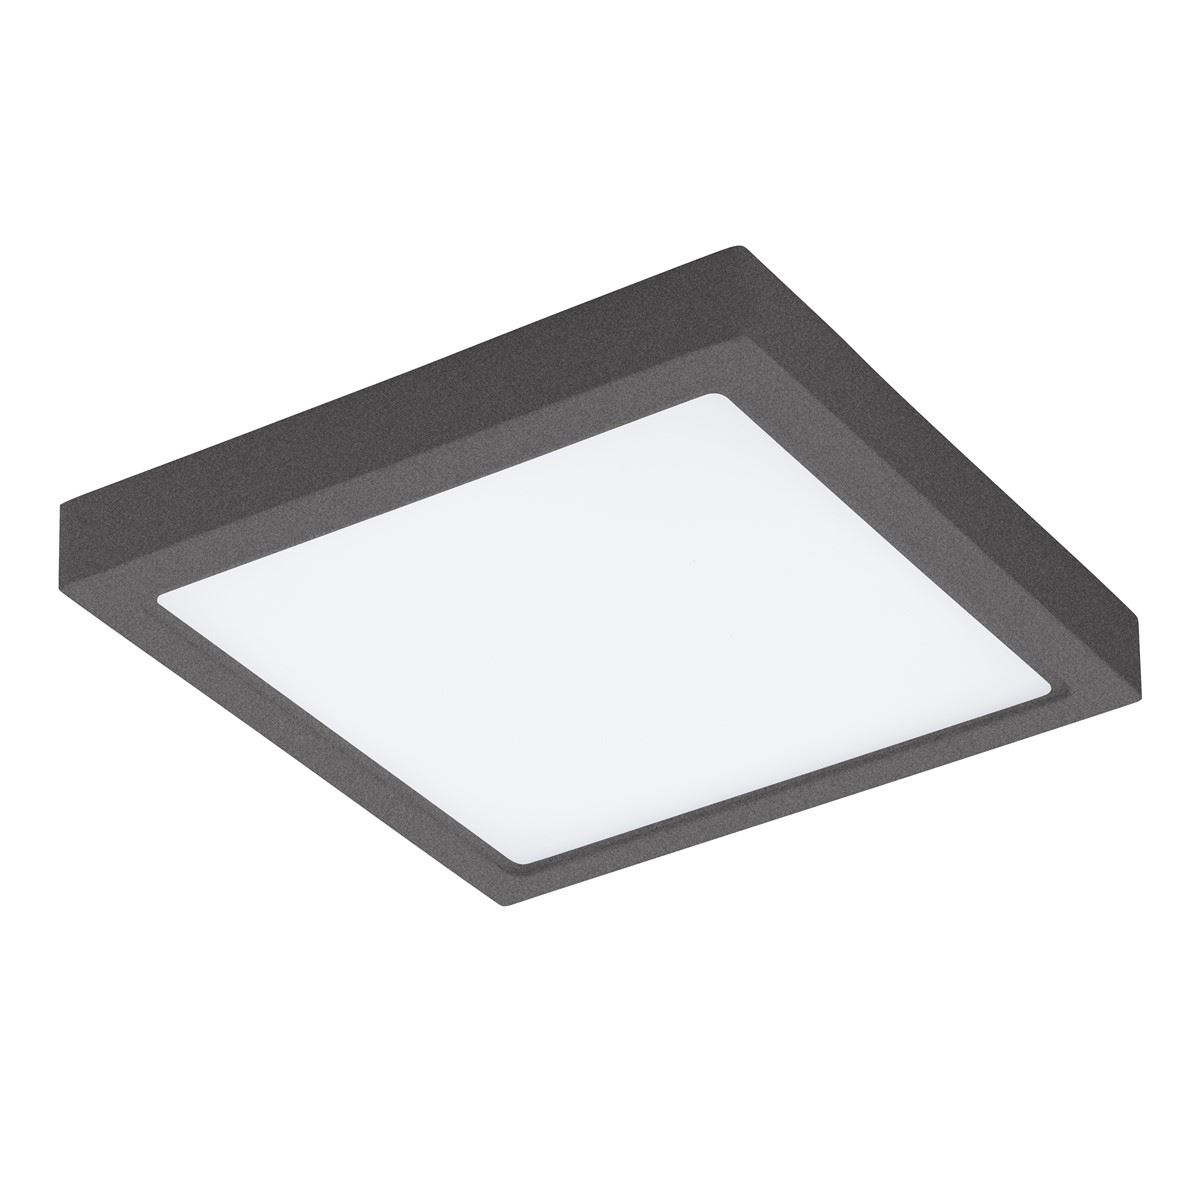 EGLO Square Ceiling Light Argolis Black Led 22W Ip44 Cast Aluminum Led